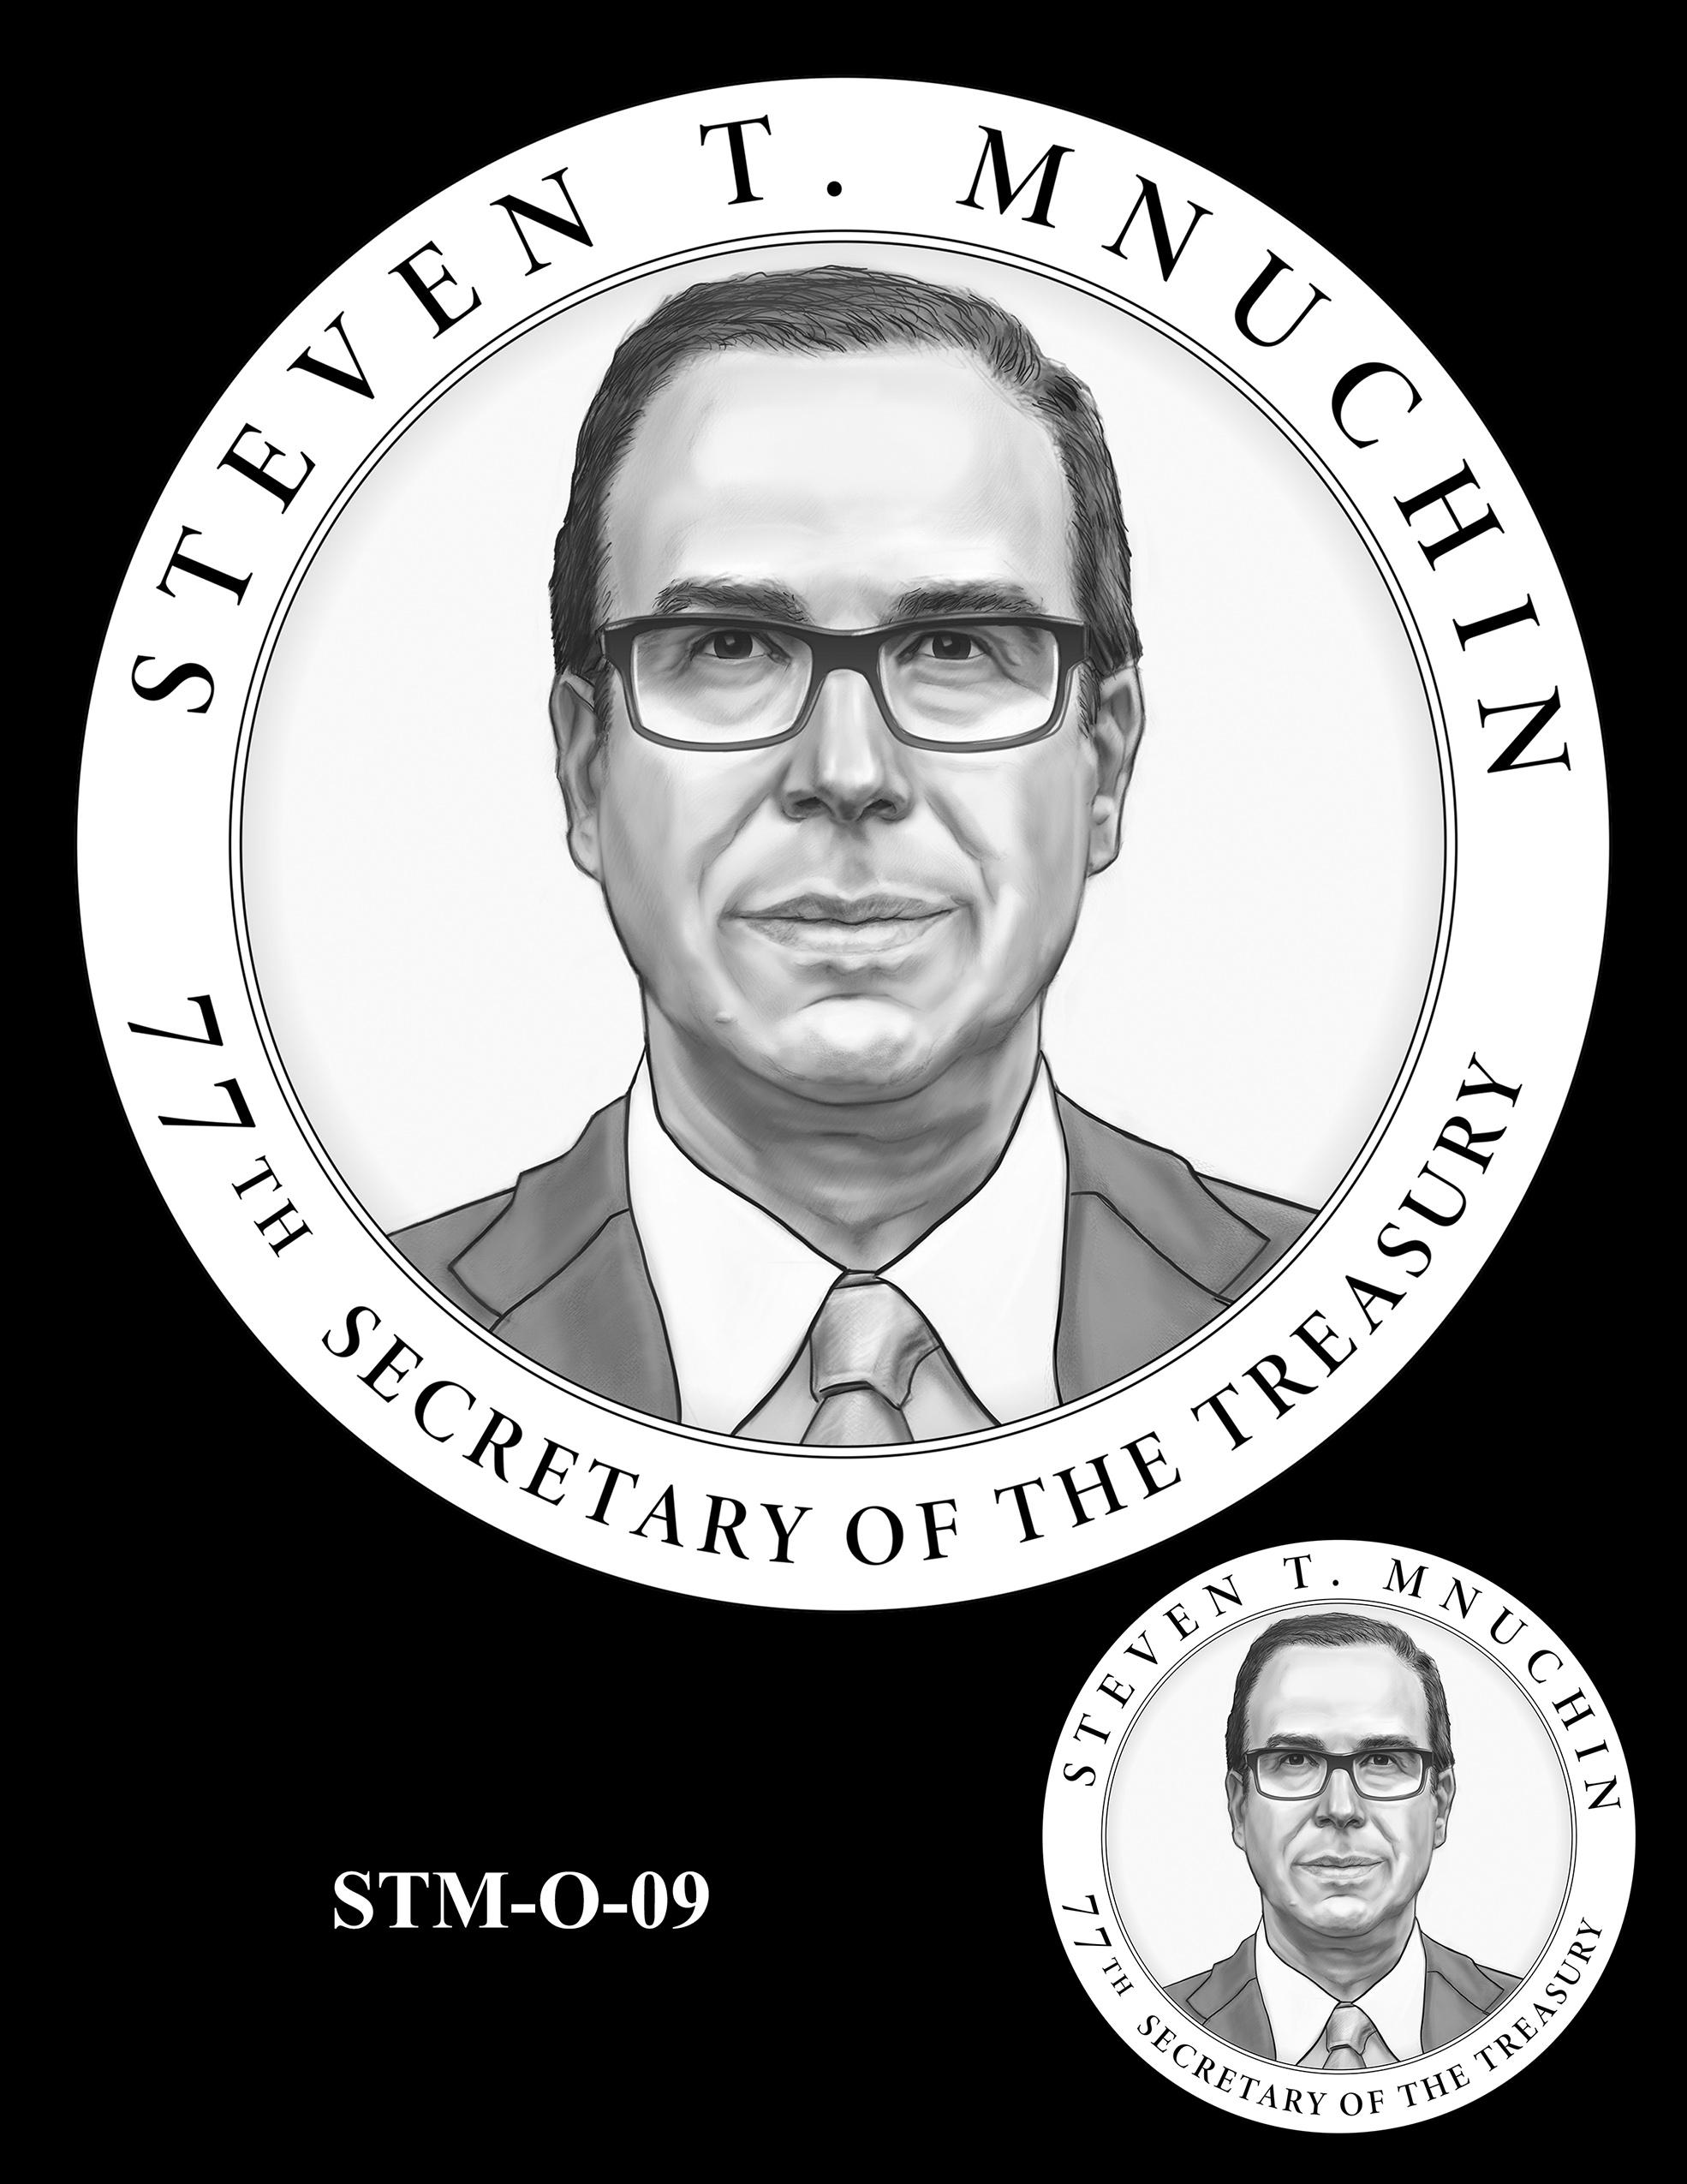 STM-O-09 -- Steven T. Mnuchin Secretary of the Treasury Medal